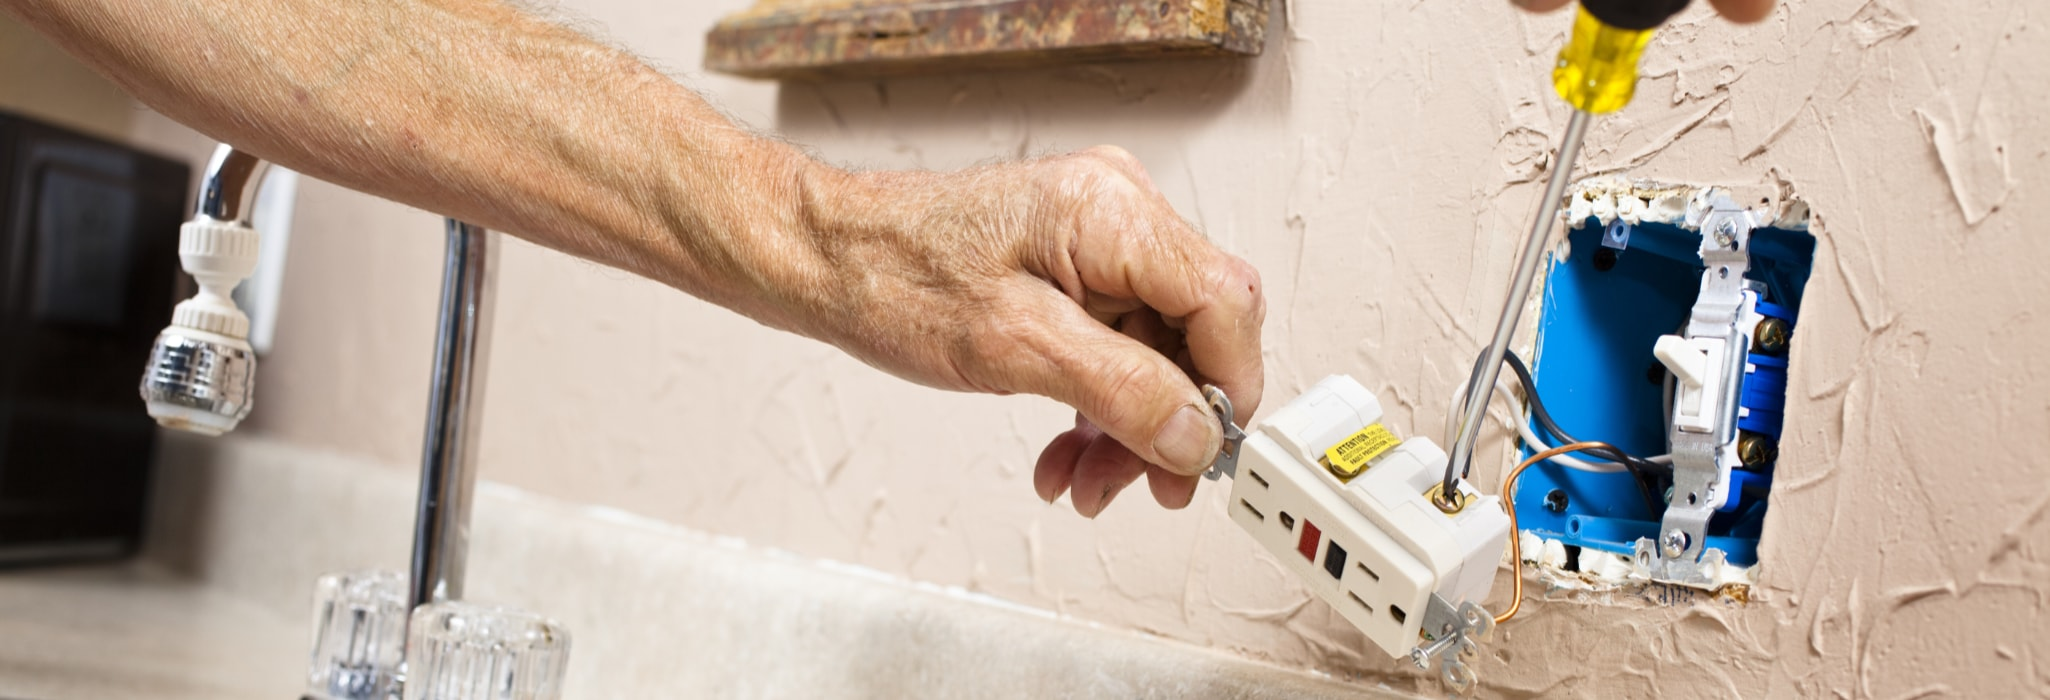 Electrician installing GFI plug in kitchen.